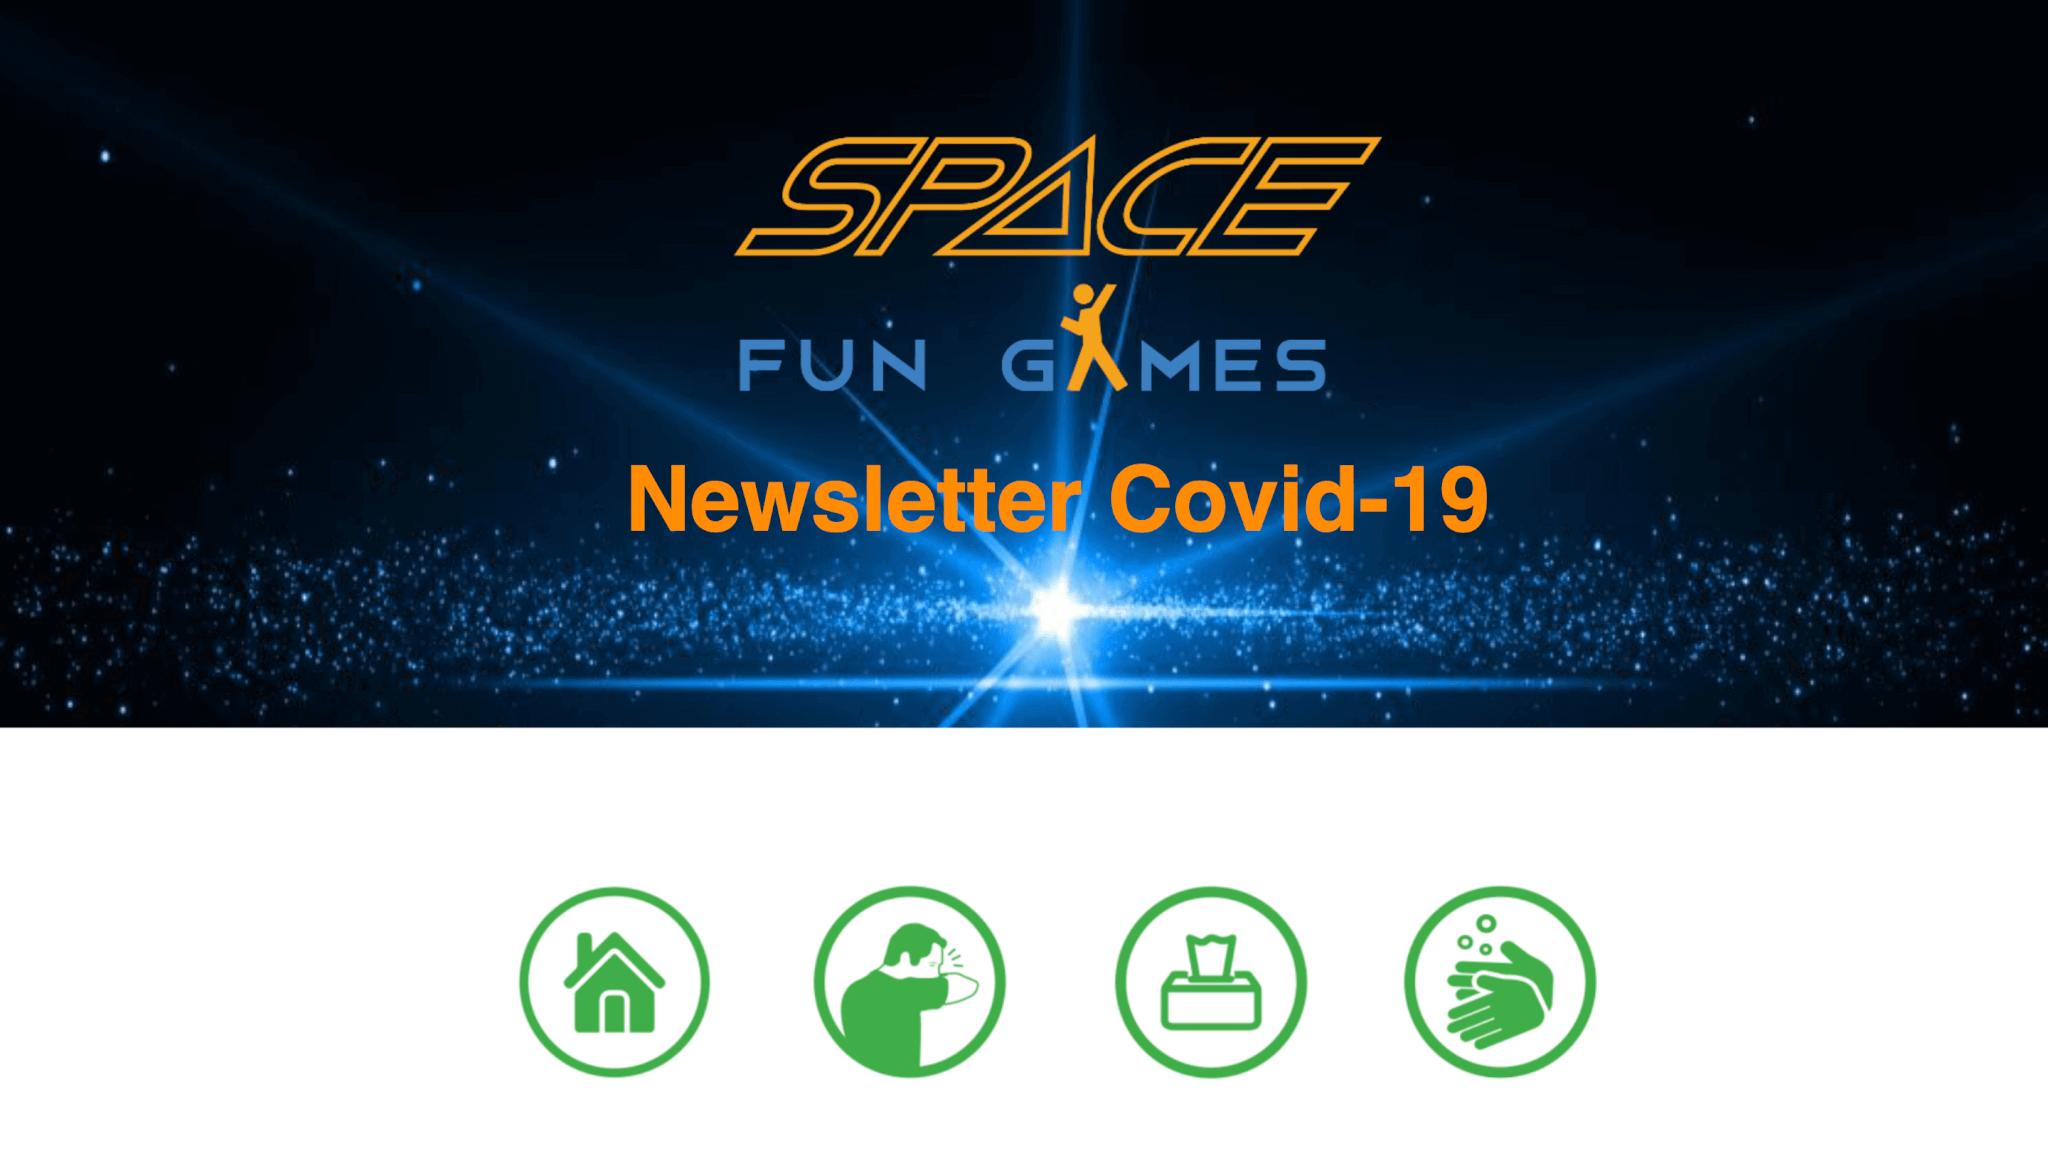 SPACE FUN GAMES